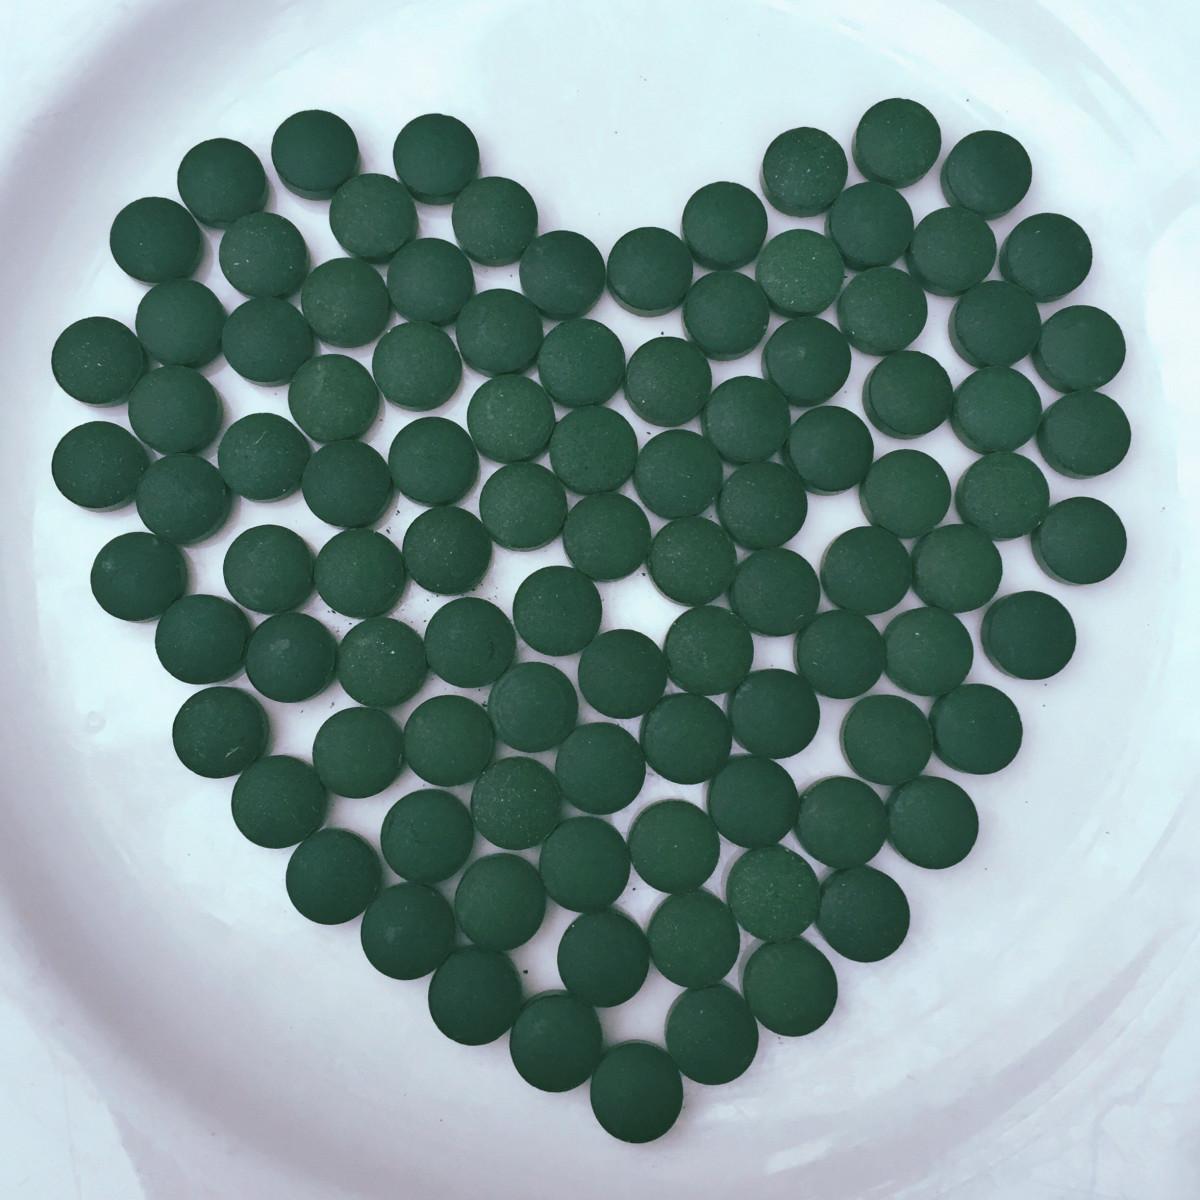 17 Benefits of Spirulina